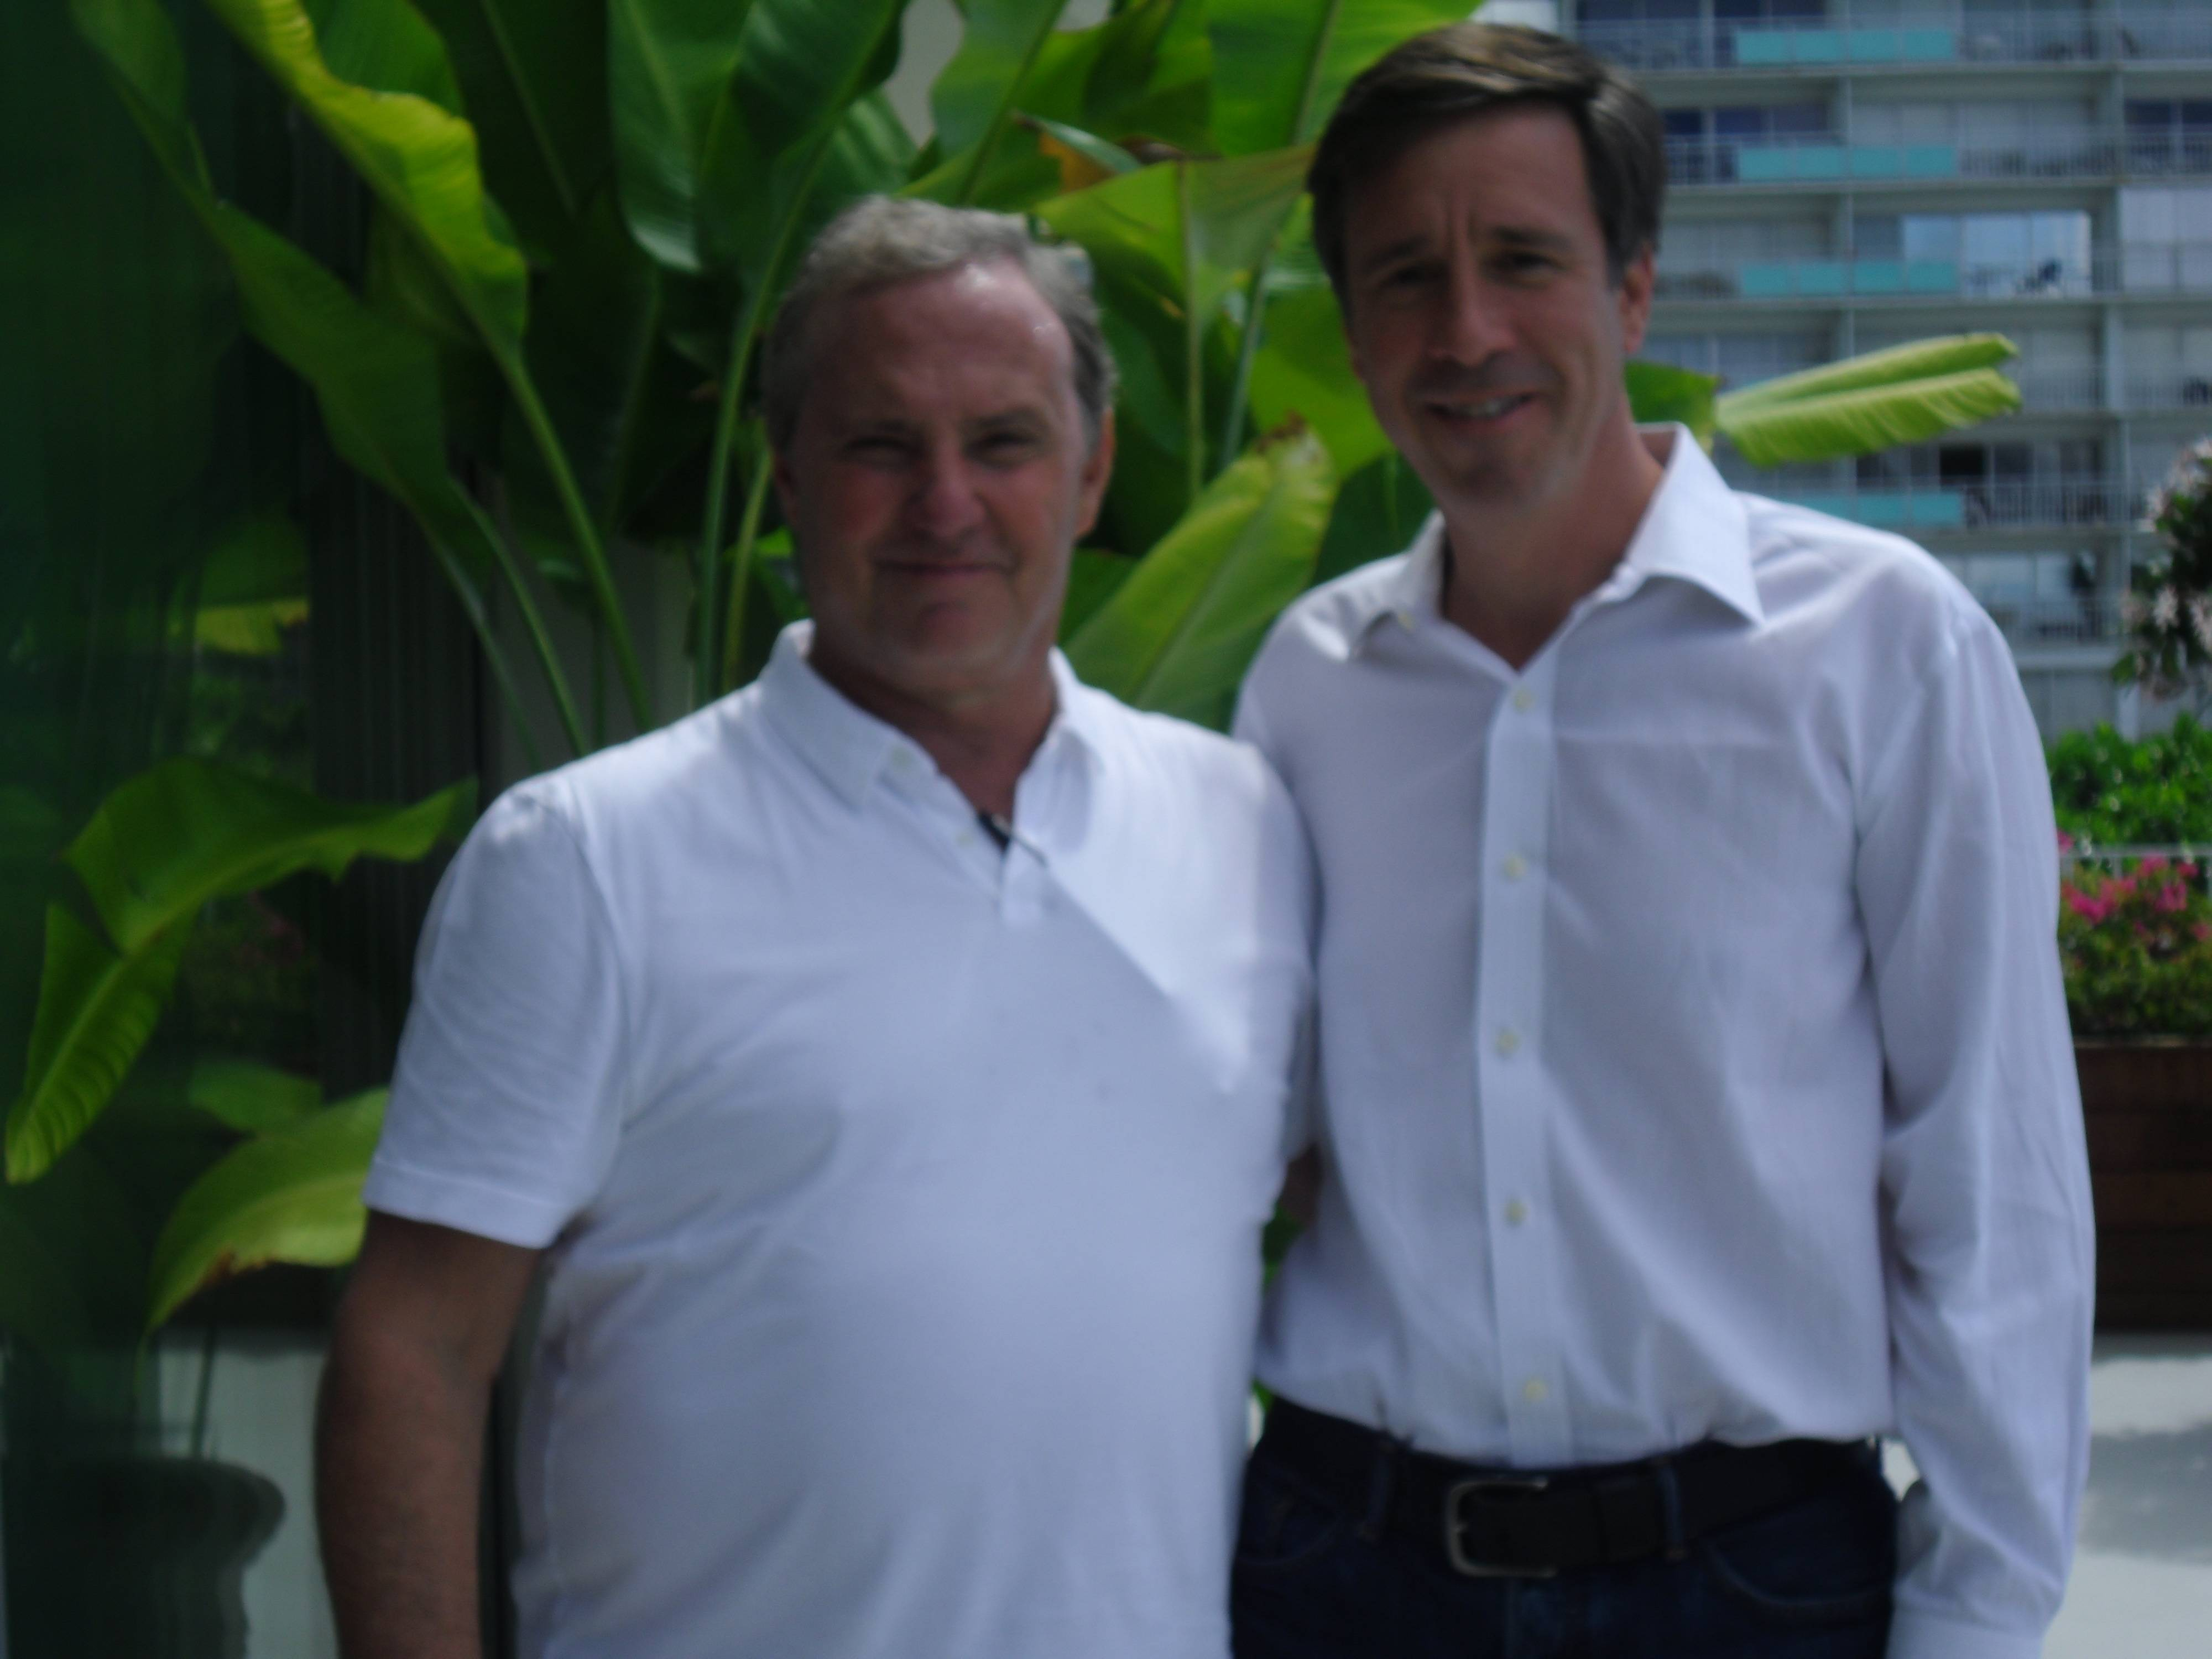 Marriott's, Arne Sorenson & Ian Schrager